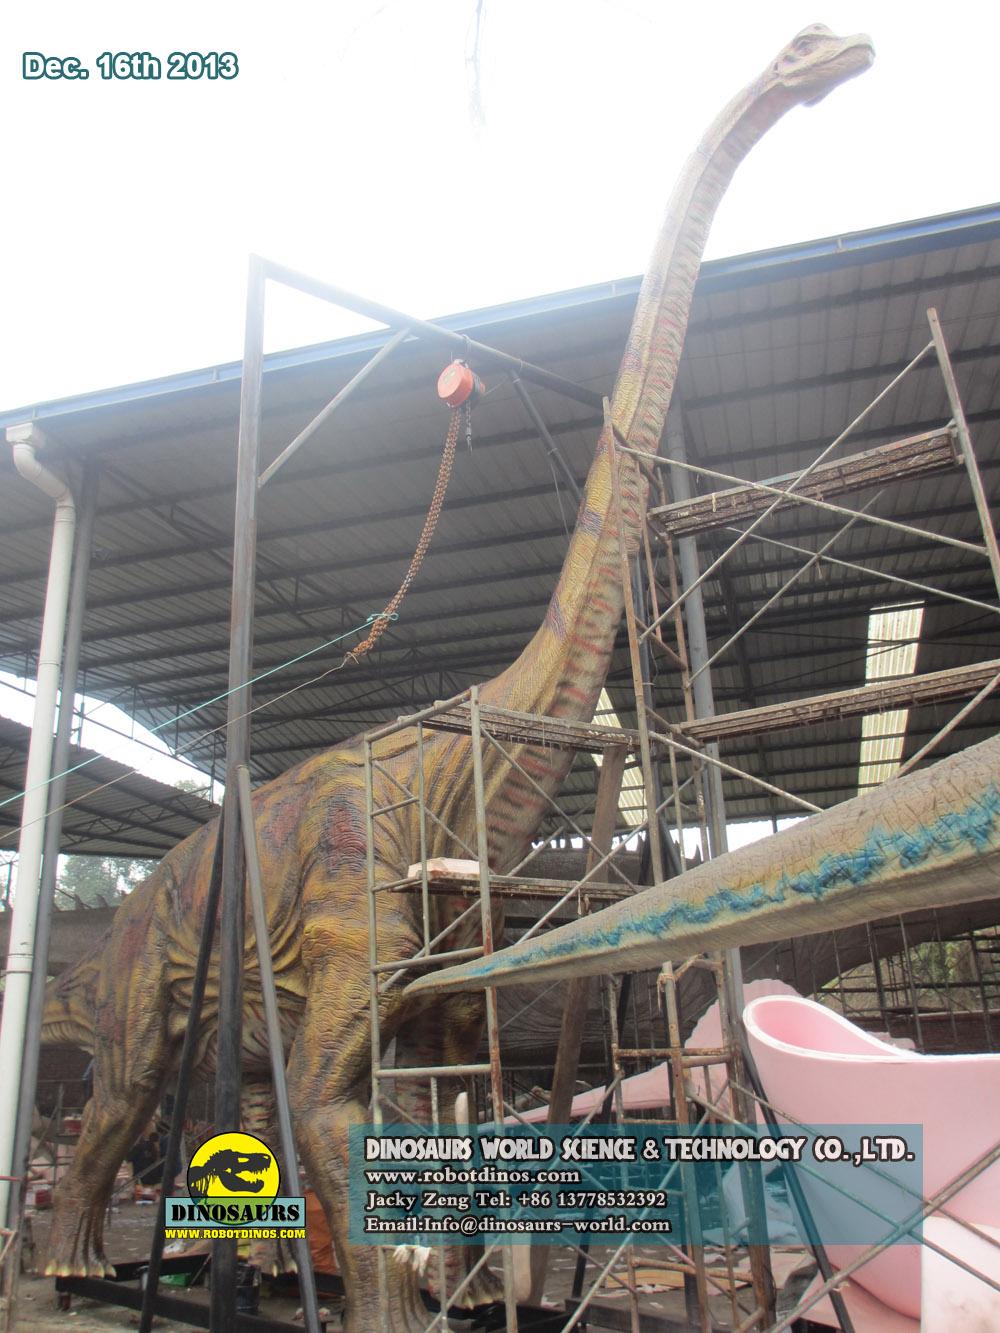 Big Robot Brachiosaurus